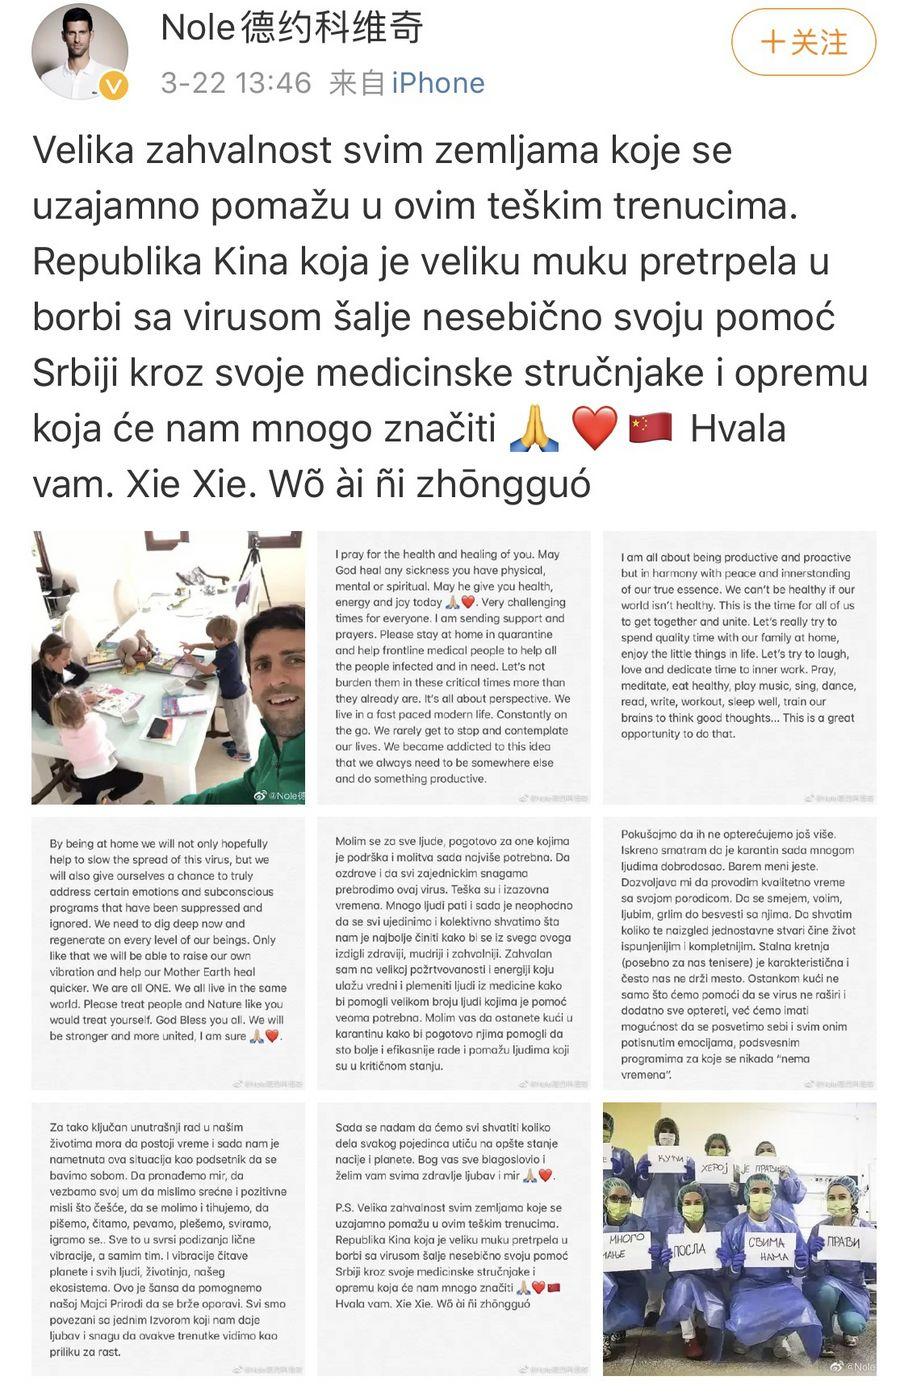 Djokovic Thanks China For Helping Serbia Fight Coronavirus Xinhua English News Cn